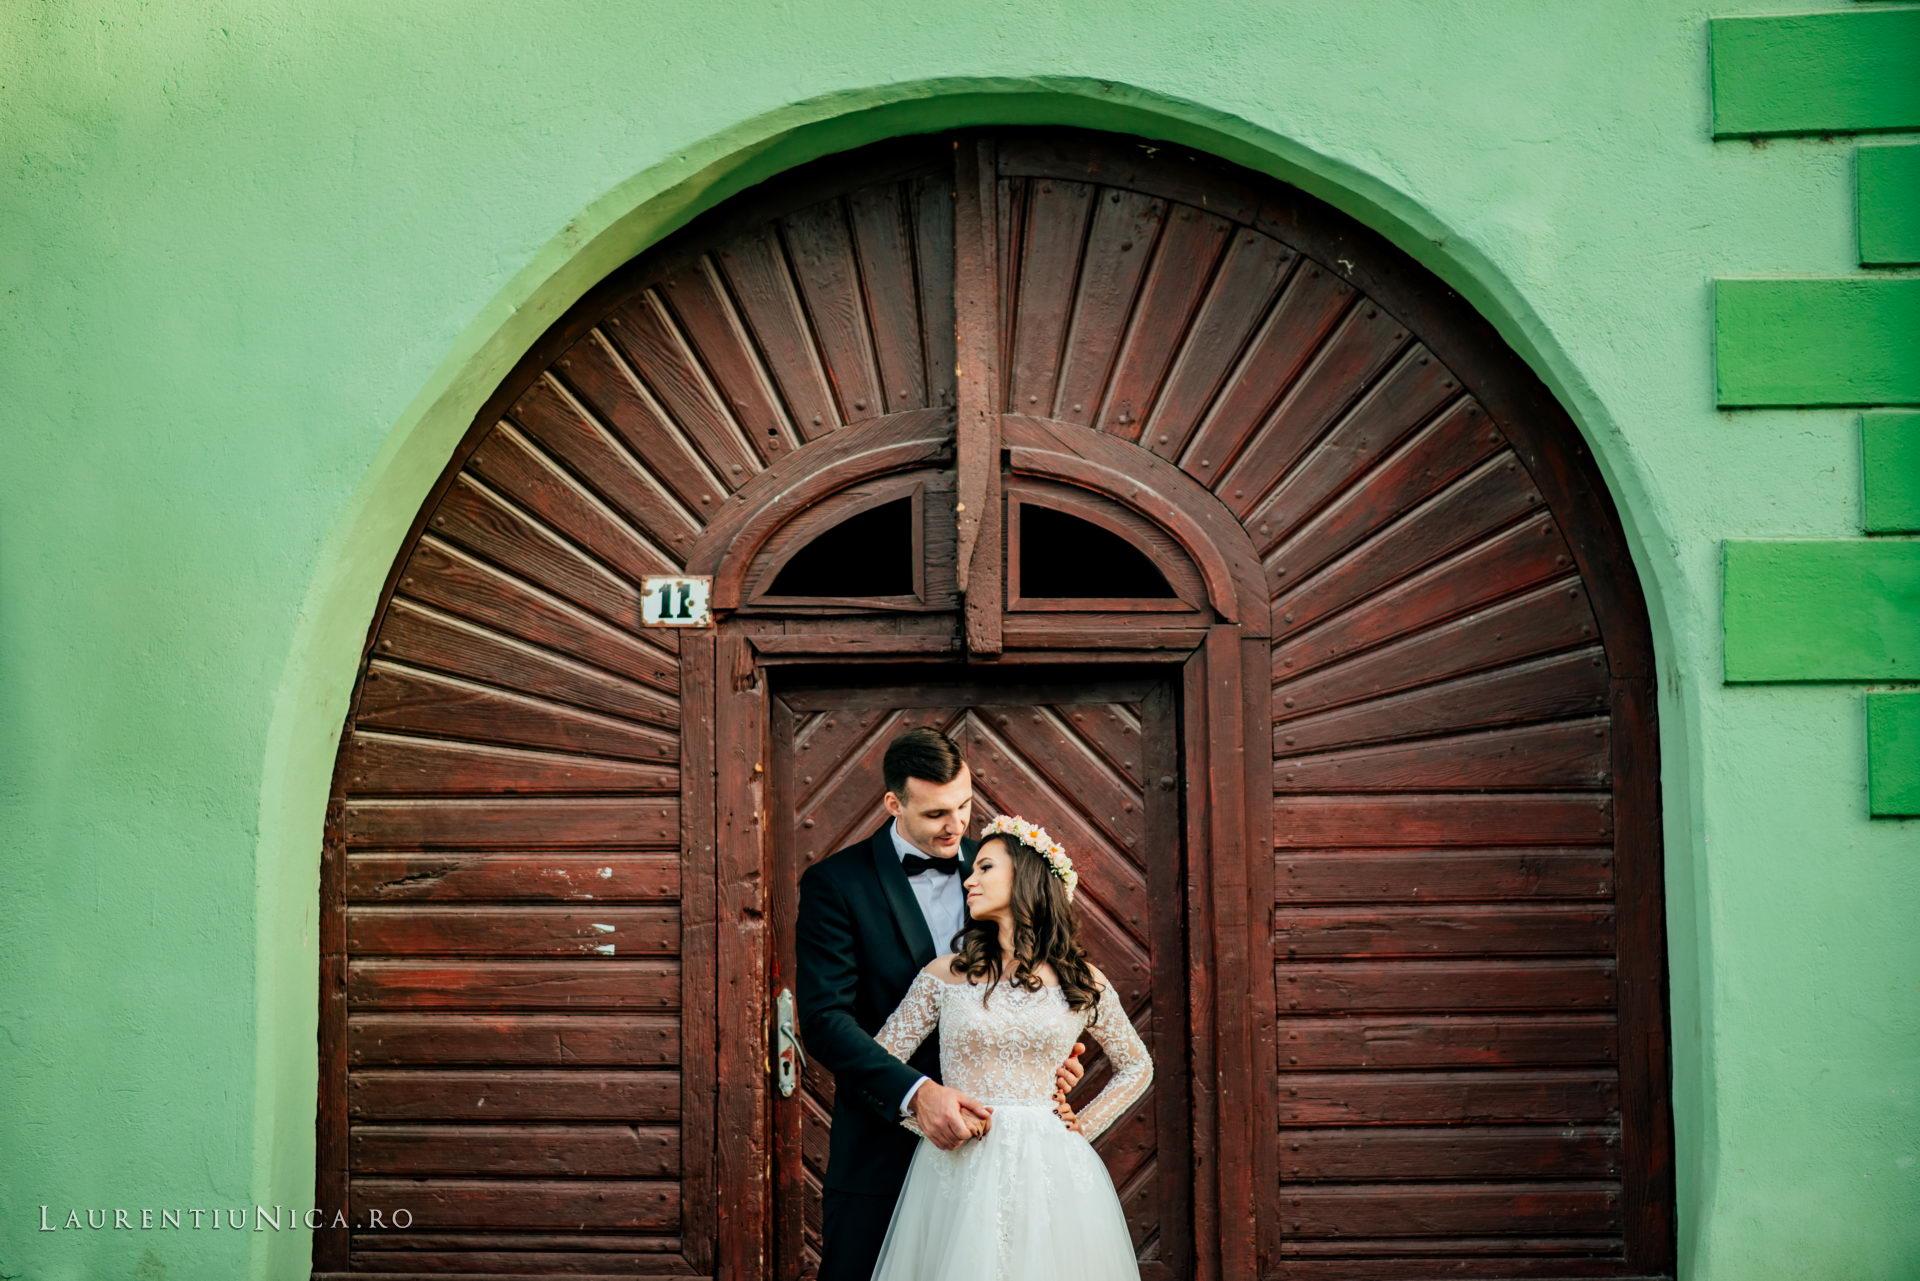 lili-si-dan-fotografii-nunta-after-wedding-sighisoara-laurentiu-nica32